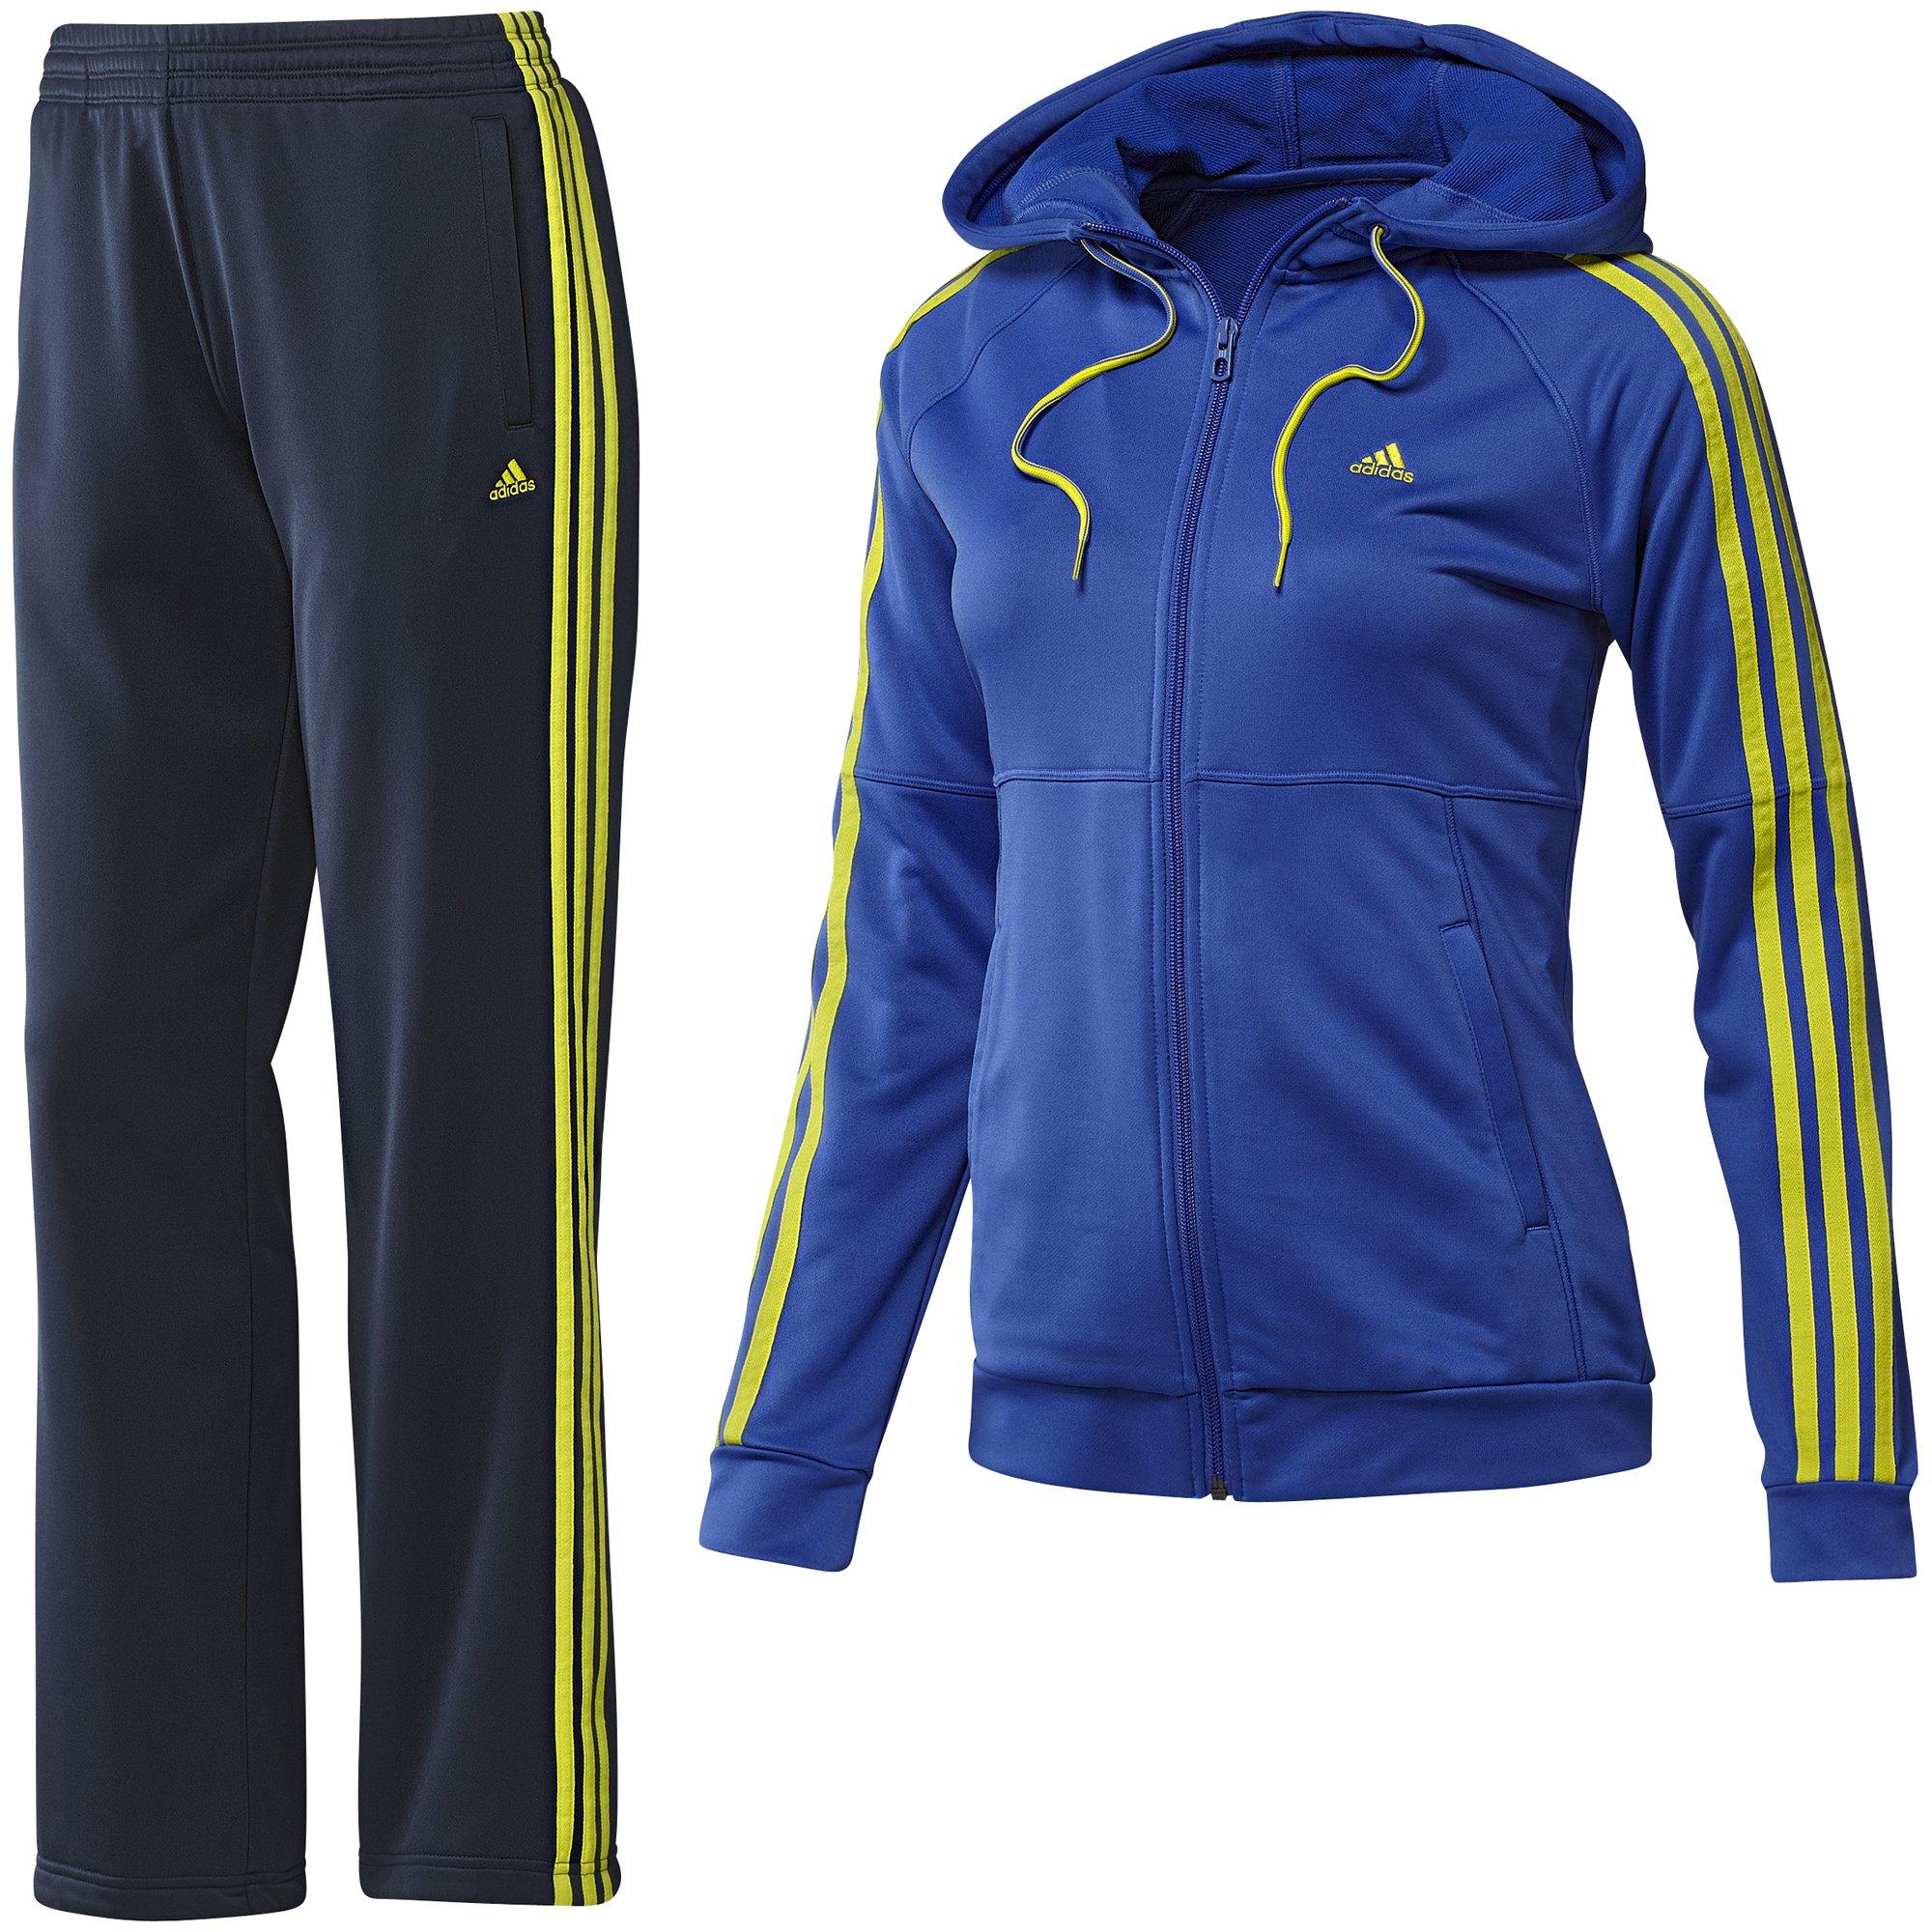 adidas damen sportanzug young knit suit. Black Bedroom Furniture Sets. Home Design Ideas